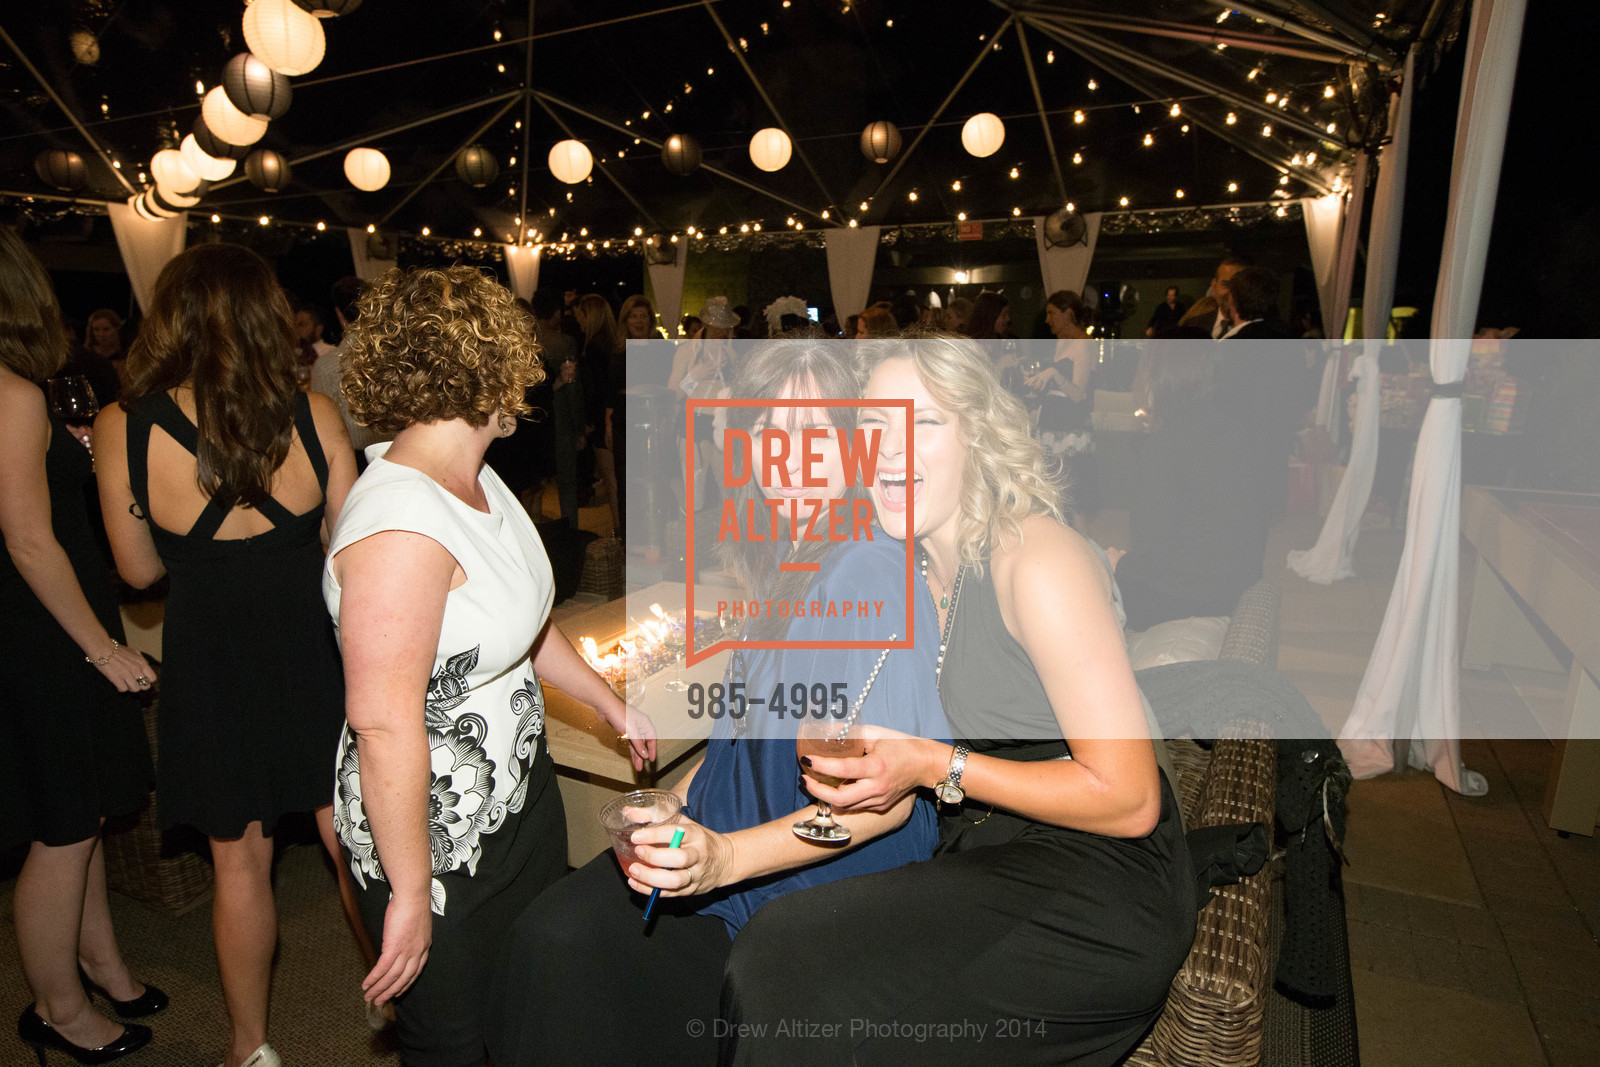 Jessica Saling, Sarah Clark, Svetlana Kolesnikova, Photo #985-4995